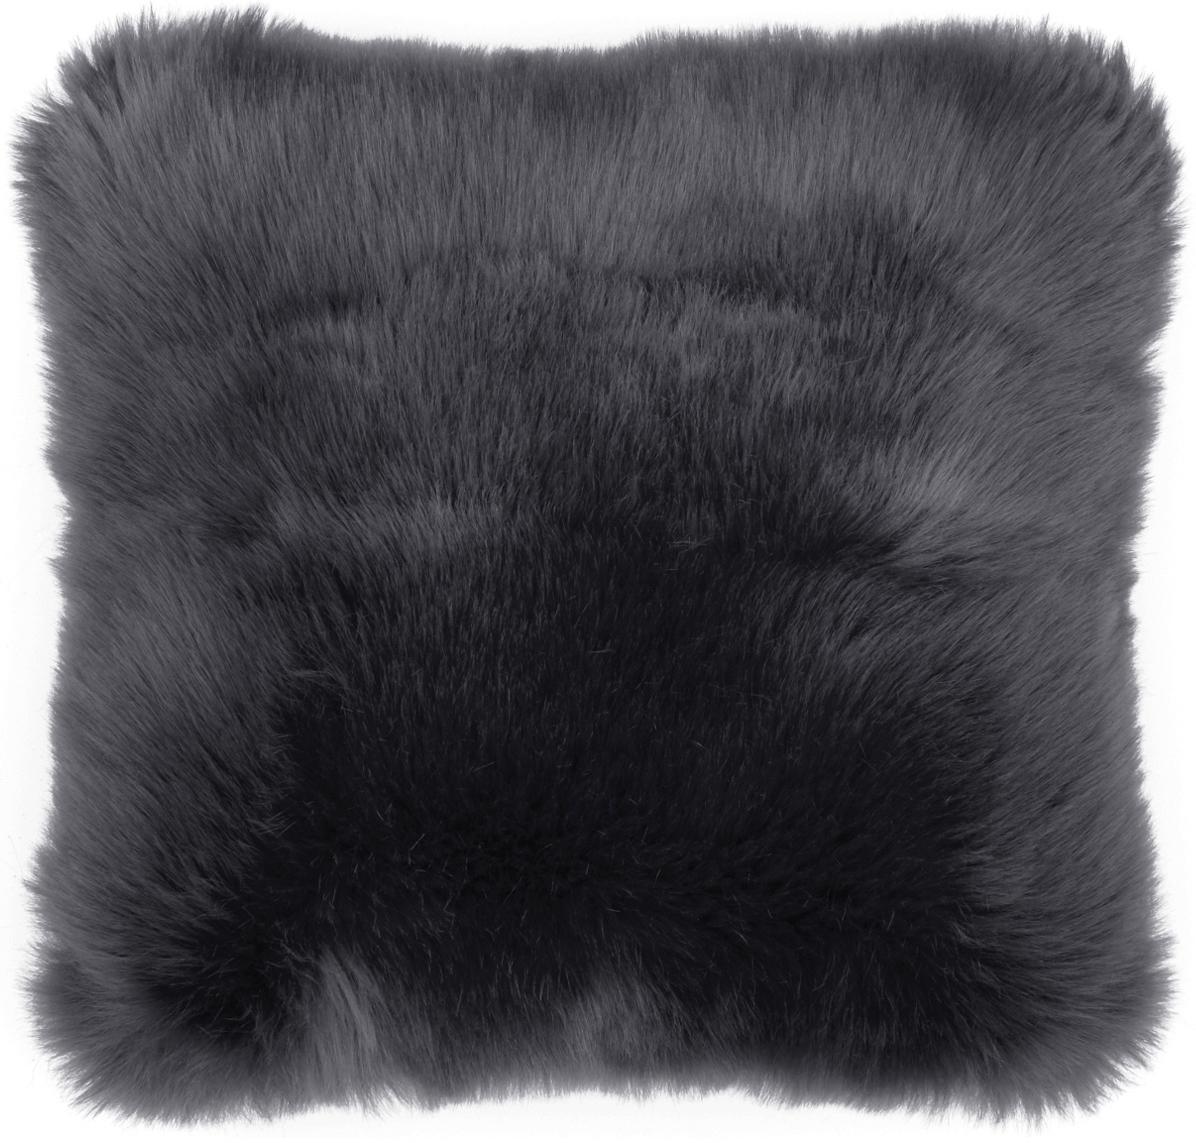 Flauschige Kunstfell-Kissenhülle Mathilde, glatt, Vorderseite: 67% Acryl, 33% Polyester, Rückseite: 100% Polyester, Dunkelgrau, 40 x 40 cm